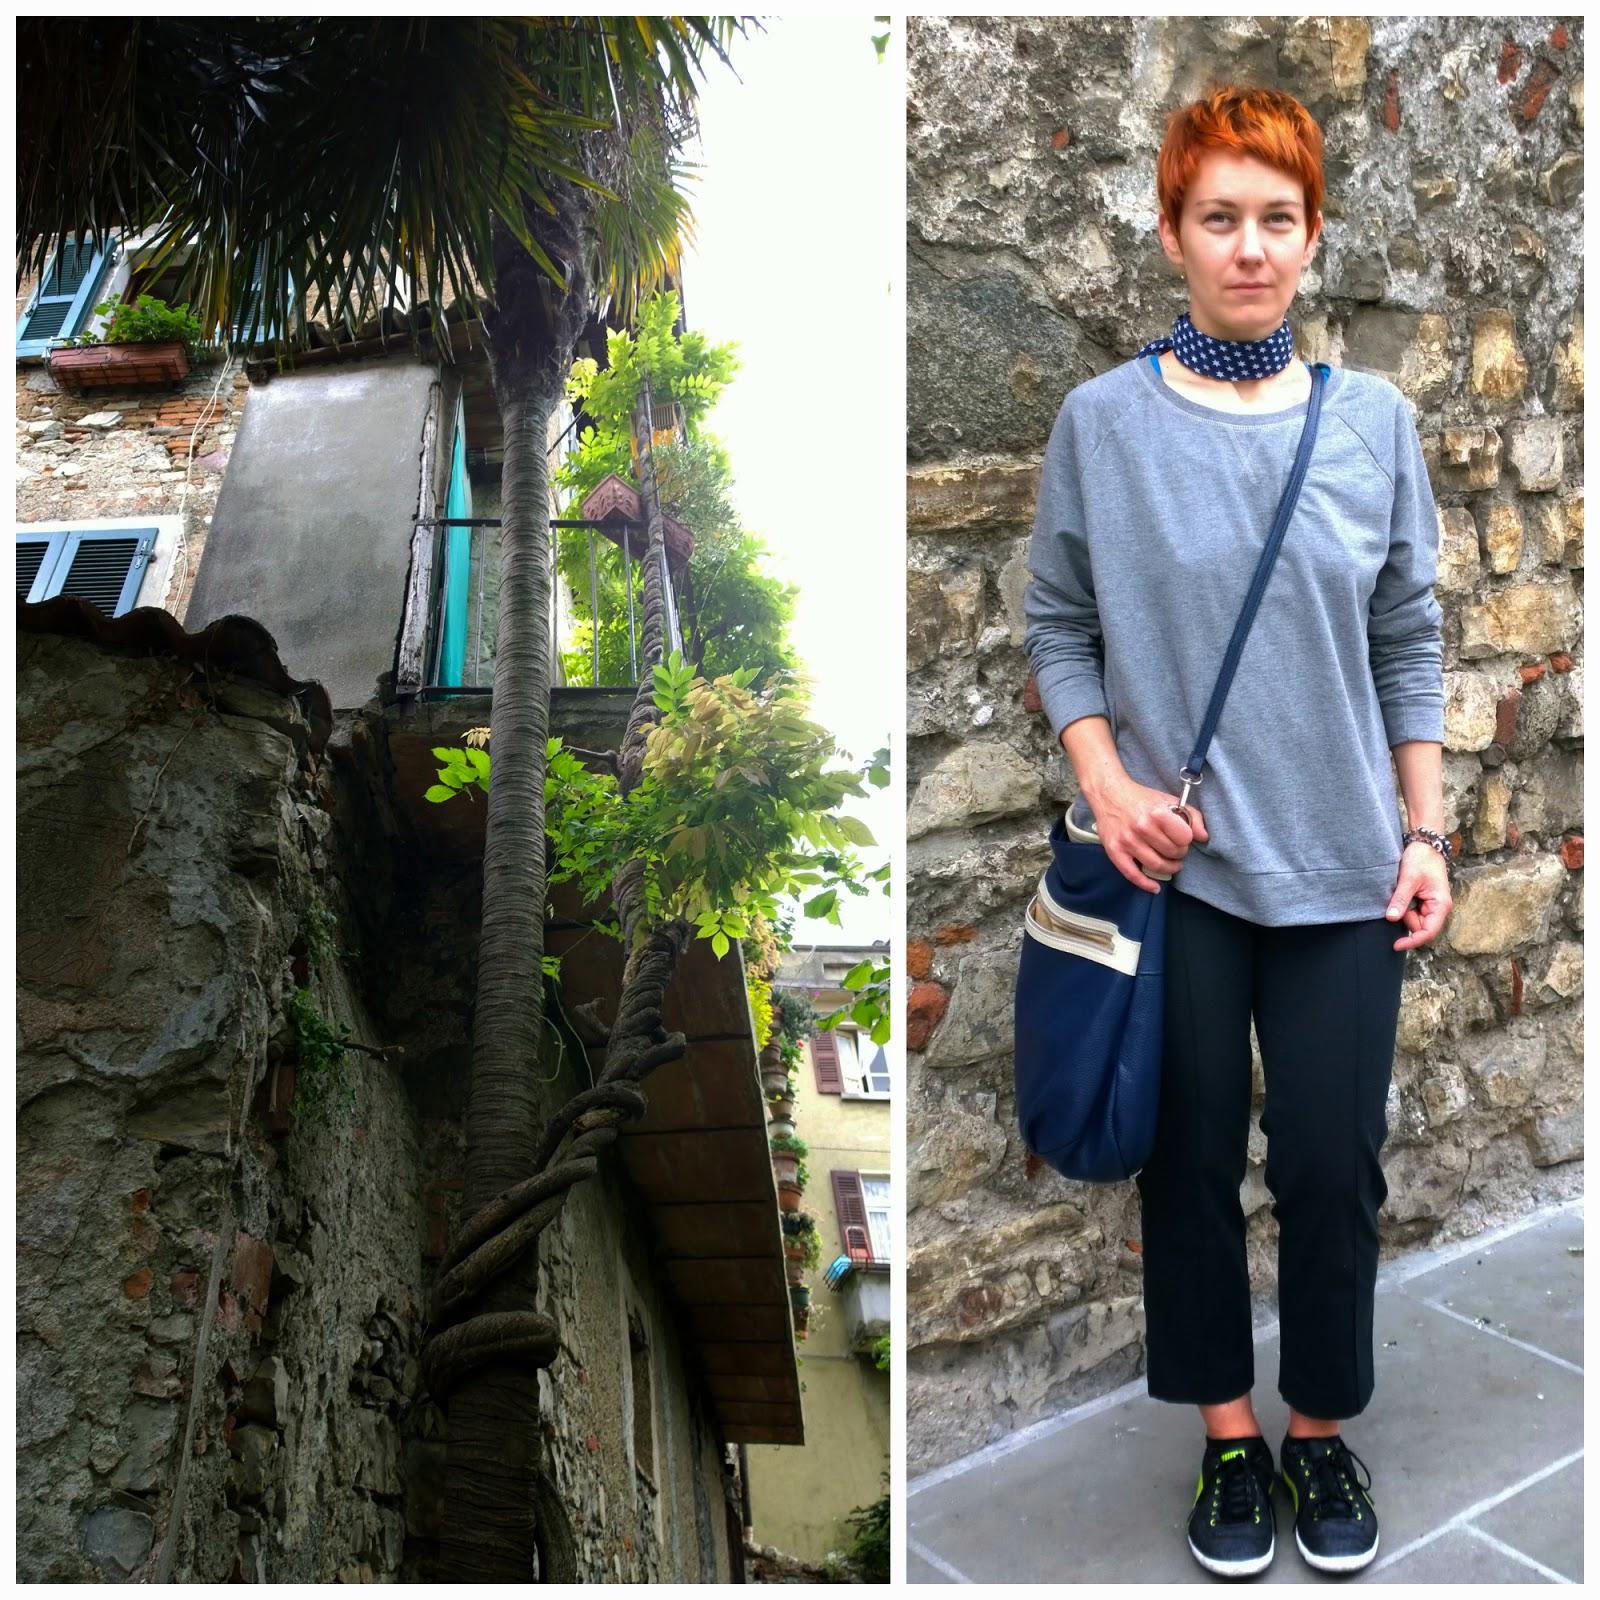 Balcone e outfit